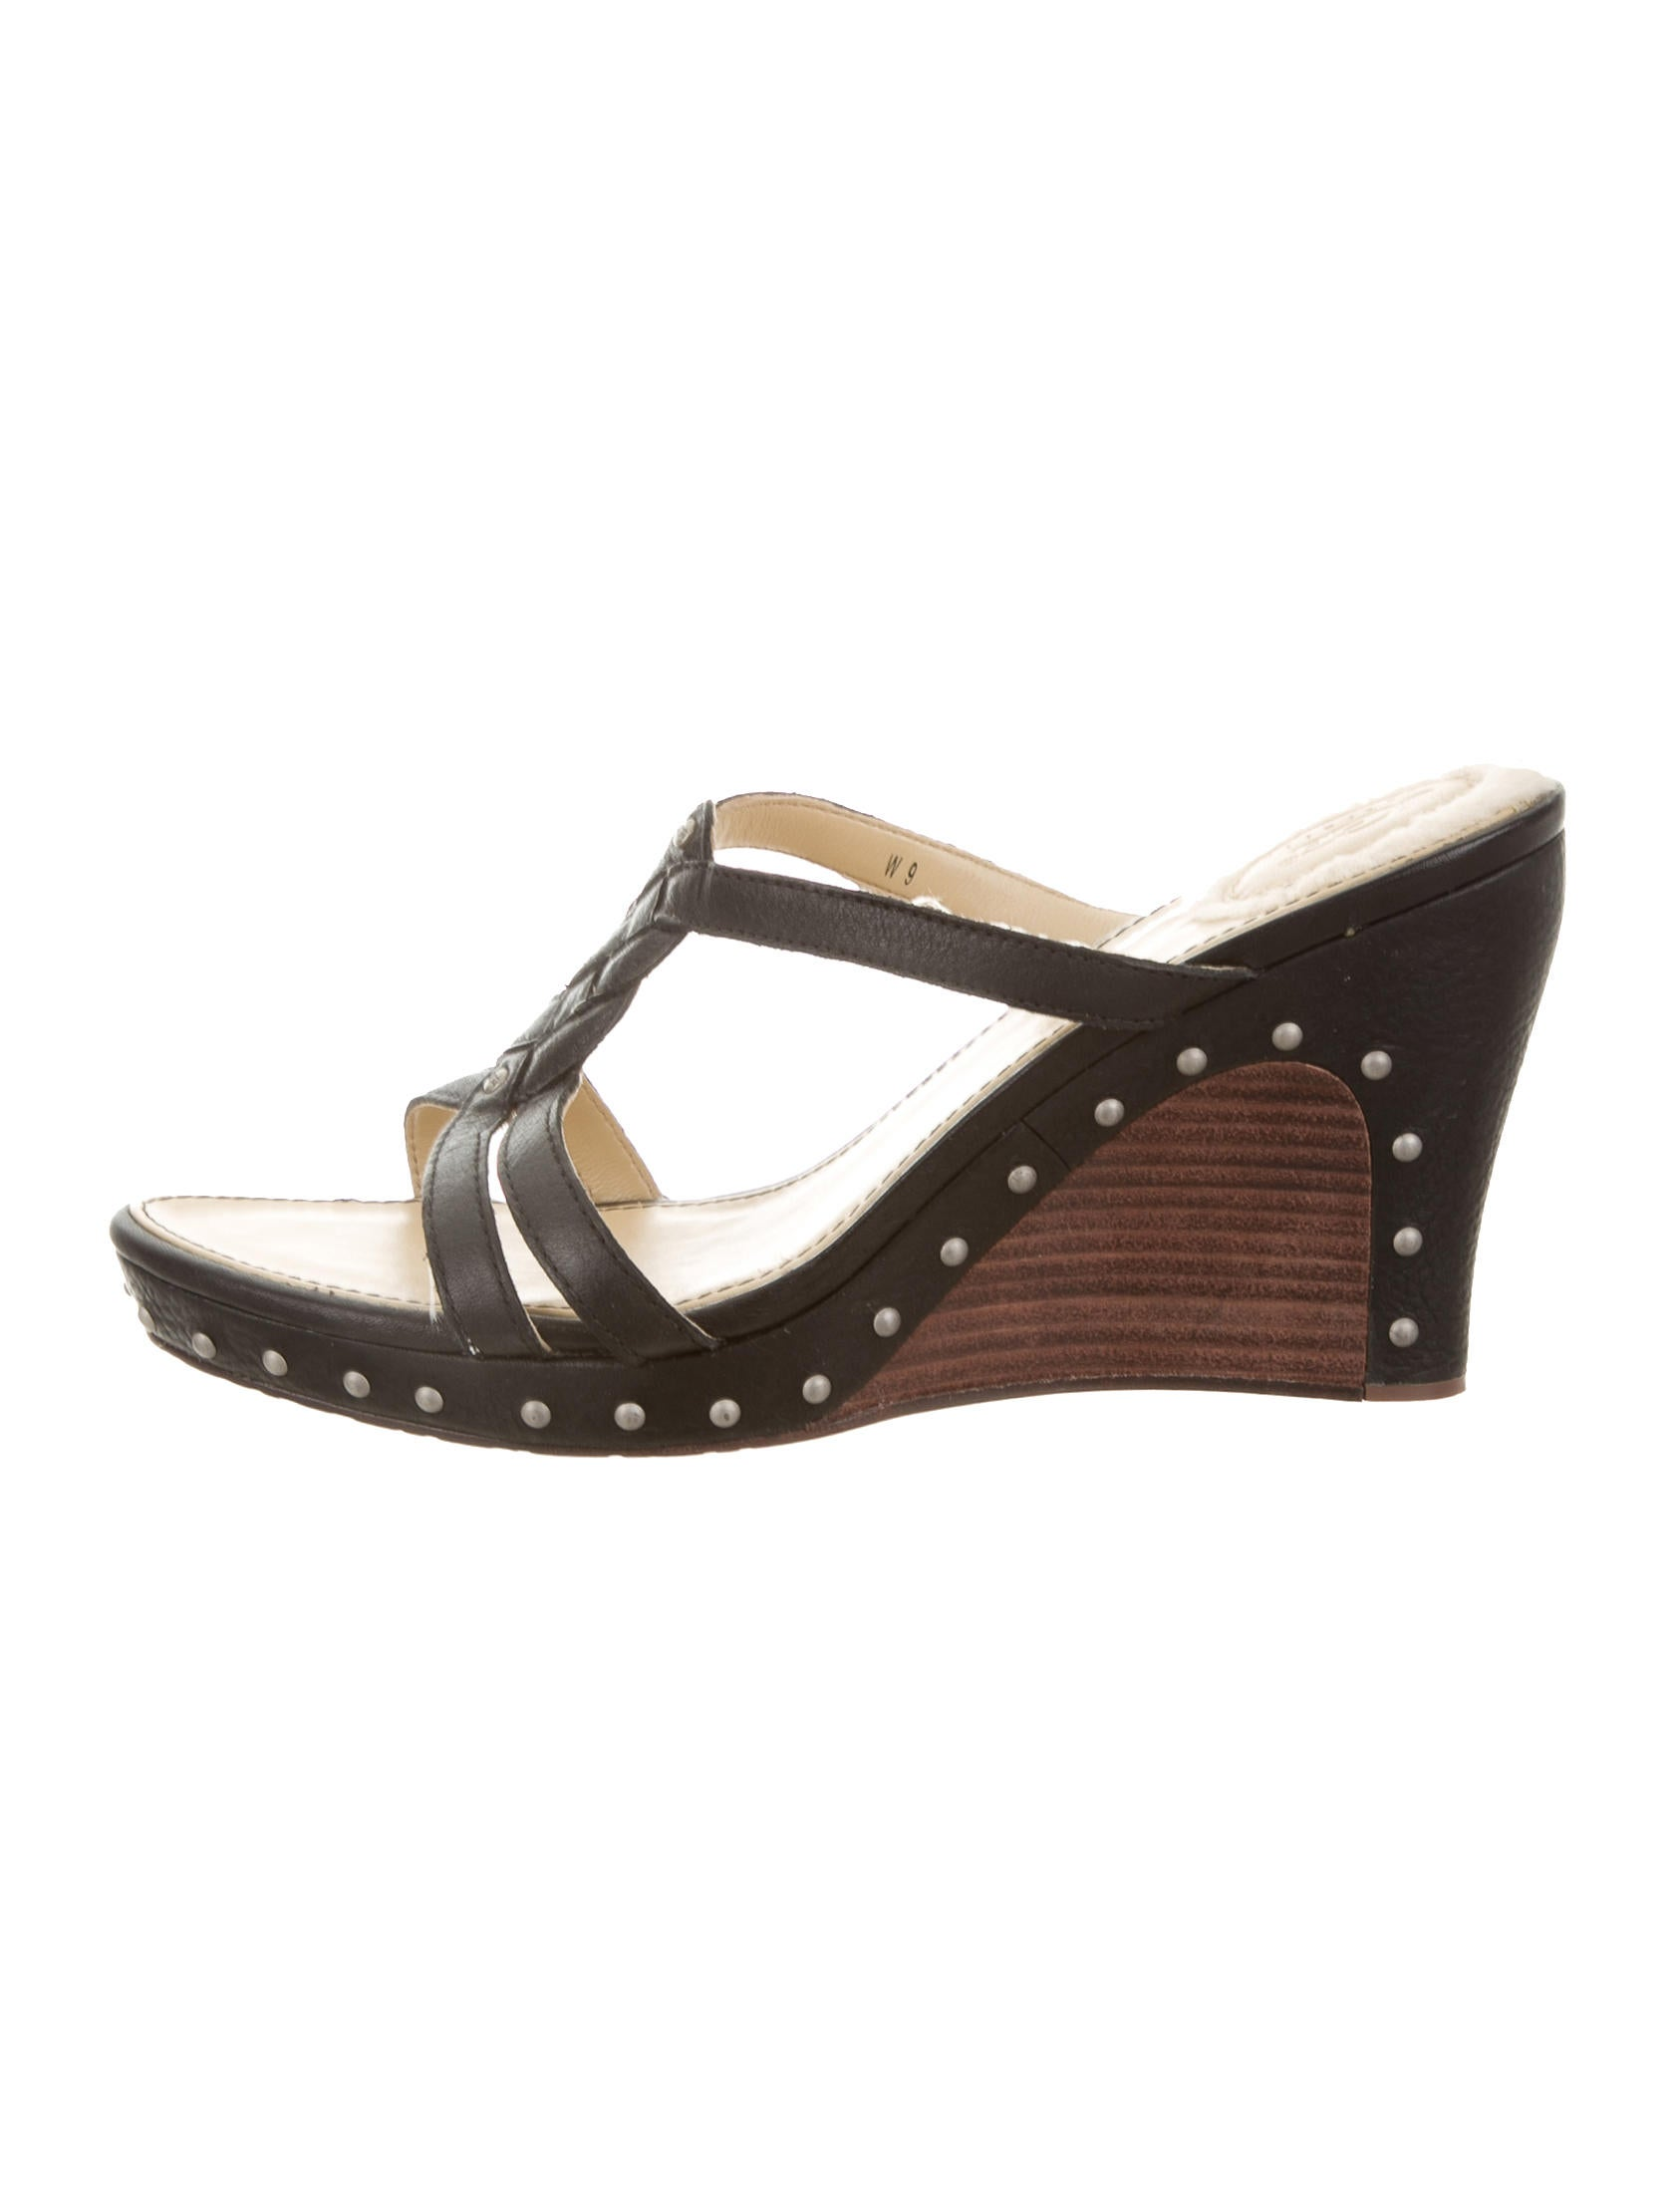 ugg australia studded leather wedges shoes wuugg21145